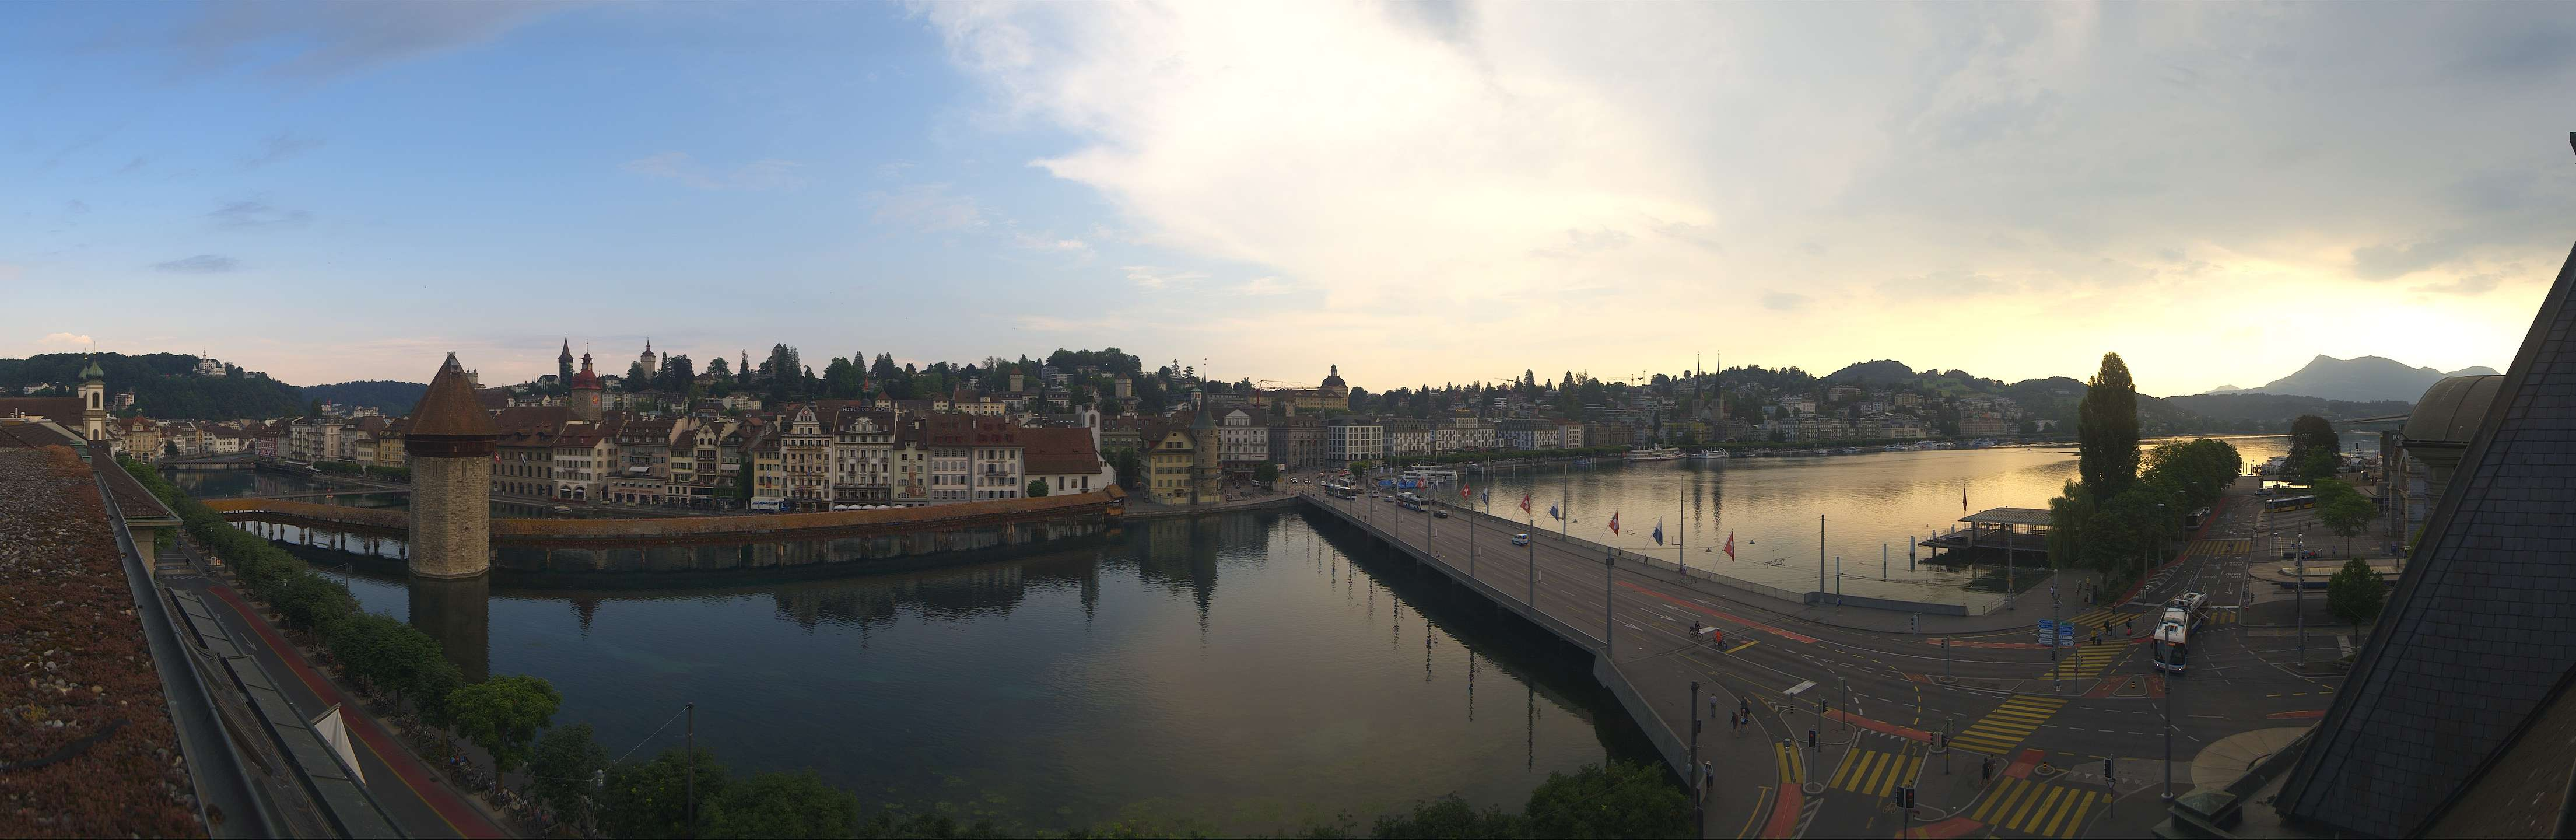 Webcam Luzern